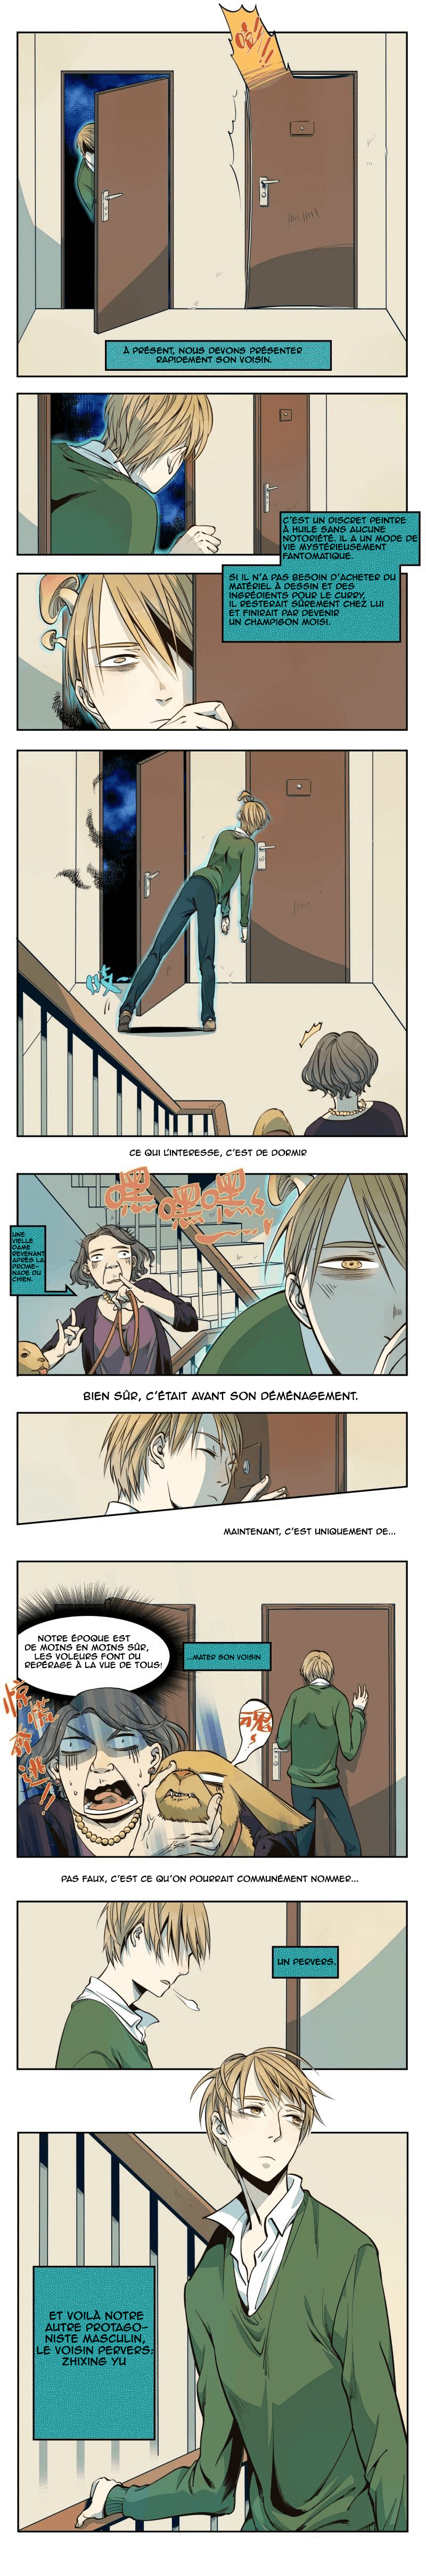 https://nine.mangadogs.com/fr_manga/pic2/7/10695/428940/NiYuWoXiangyuChapitre1_1_434.png Page 2